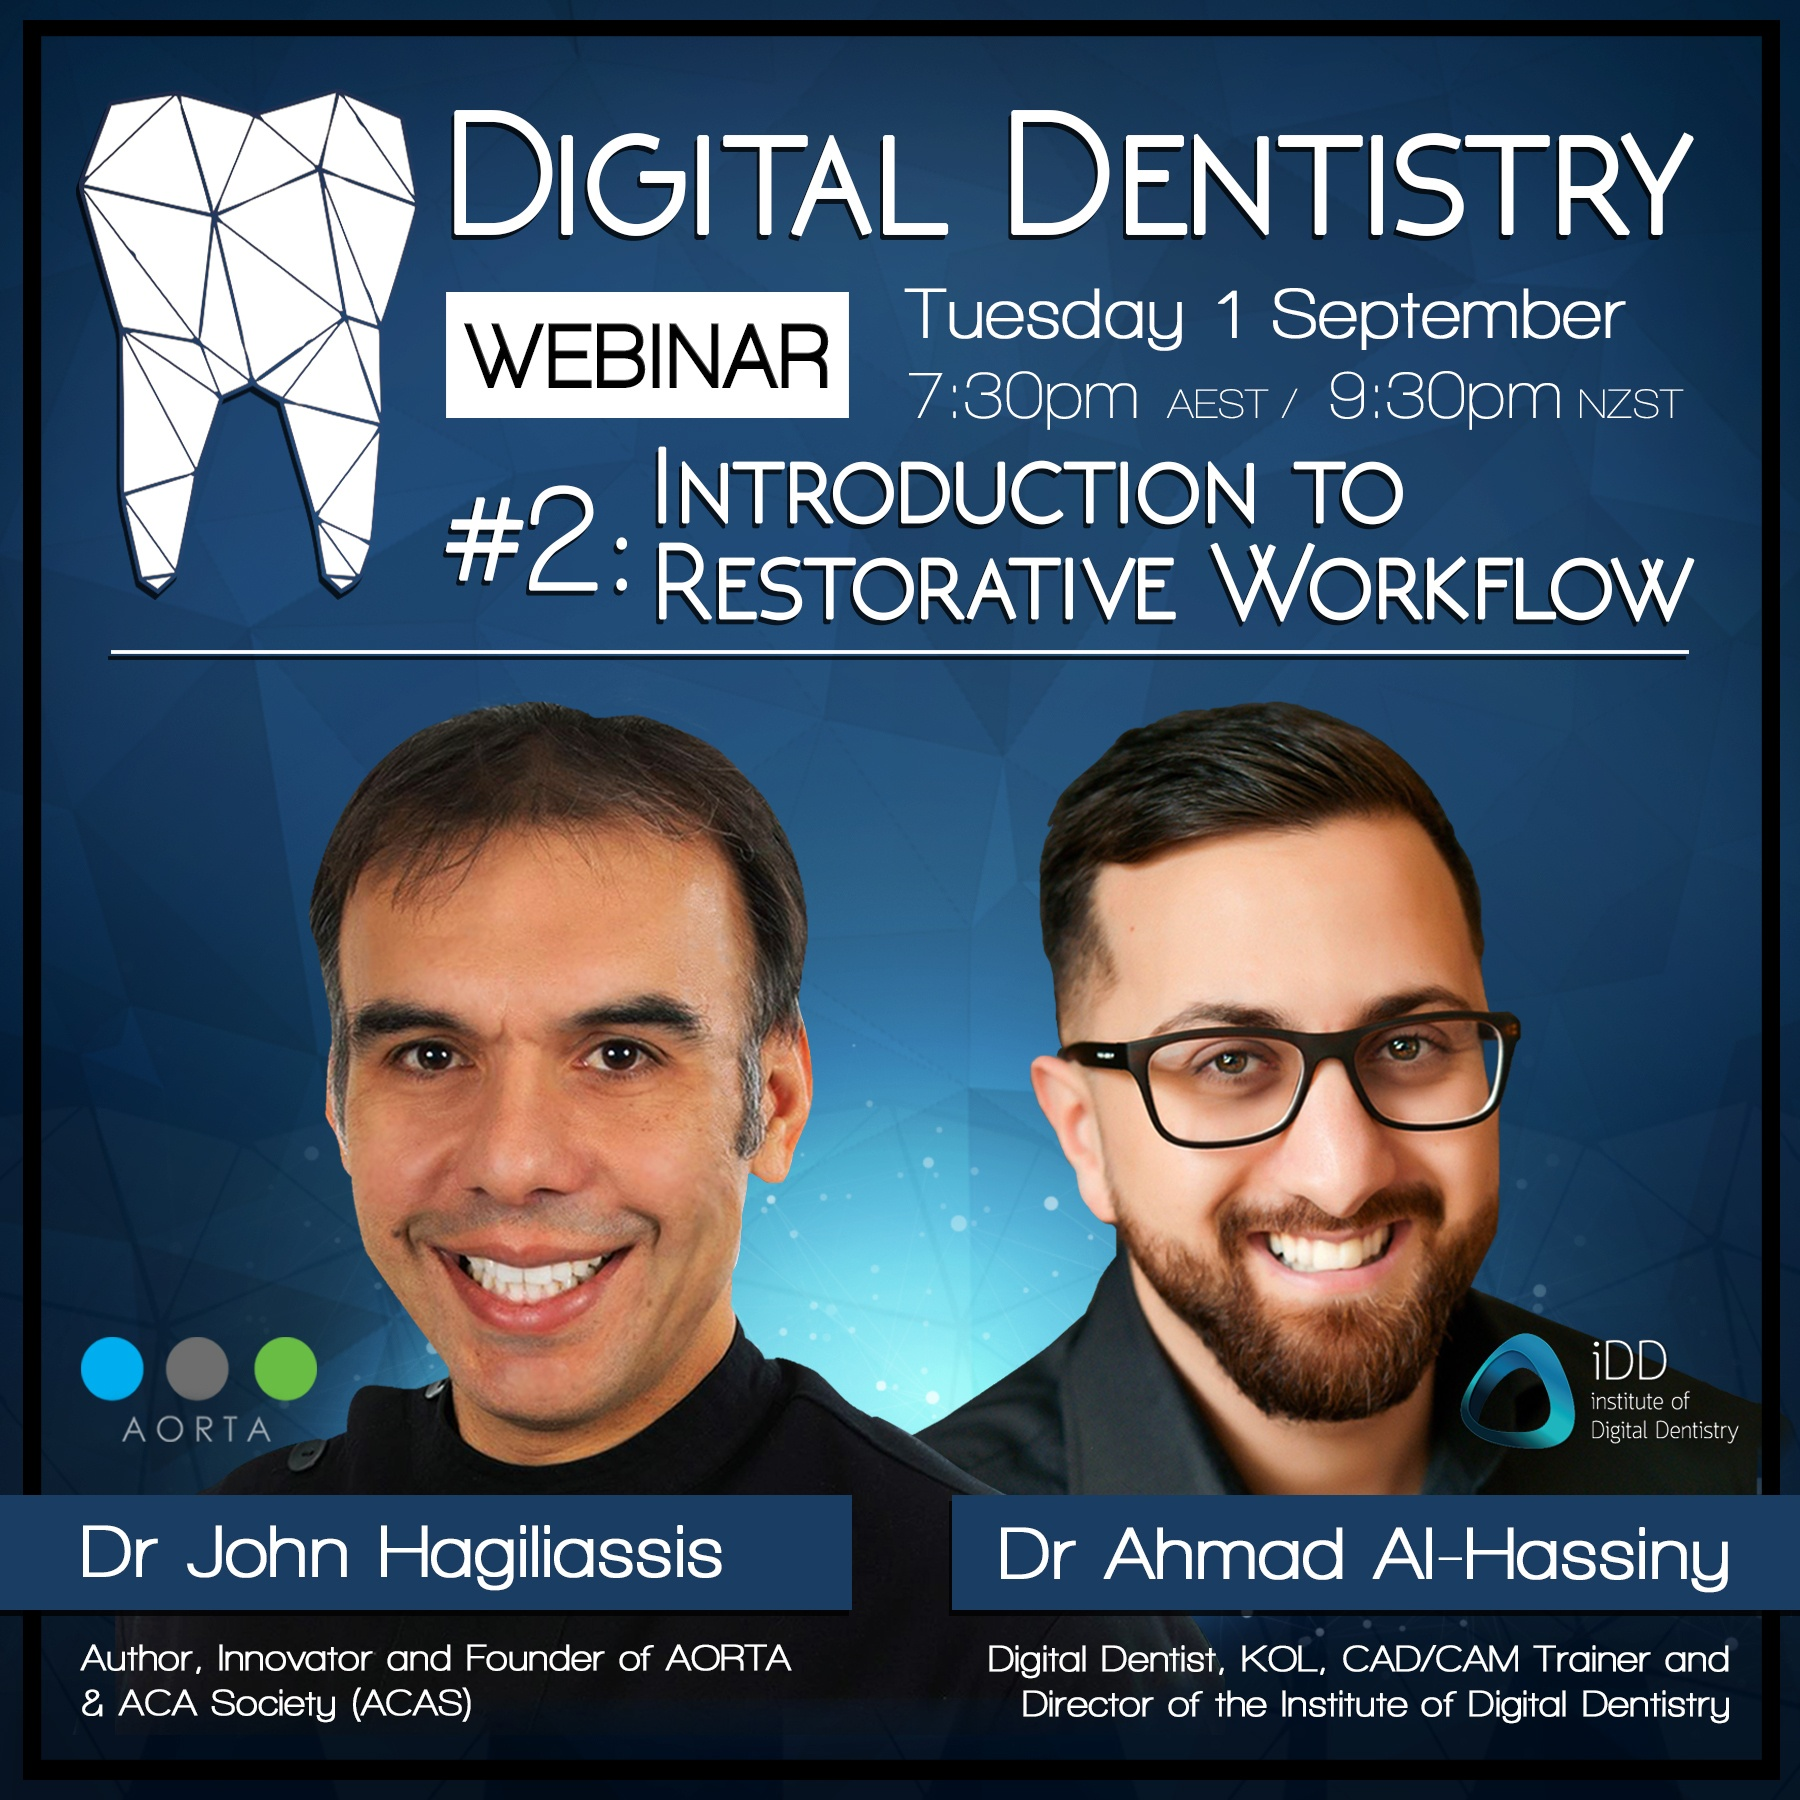 digital dentistry webinar institute of digital dentistry